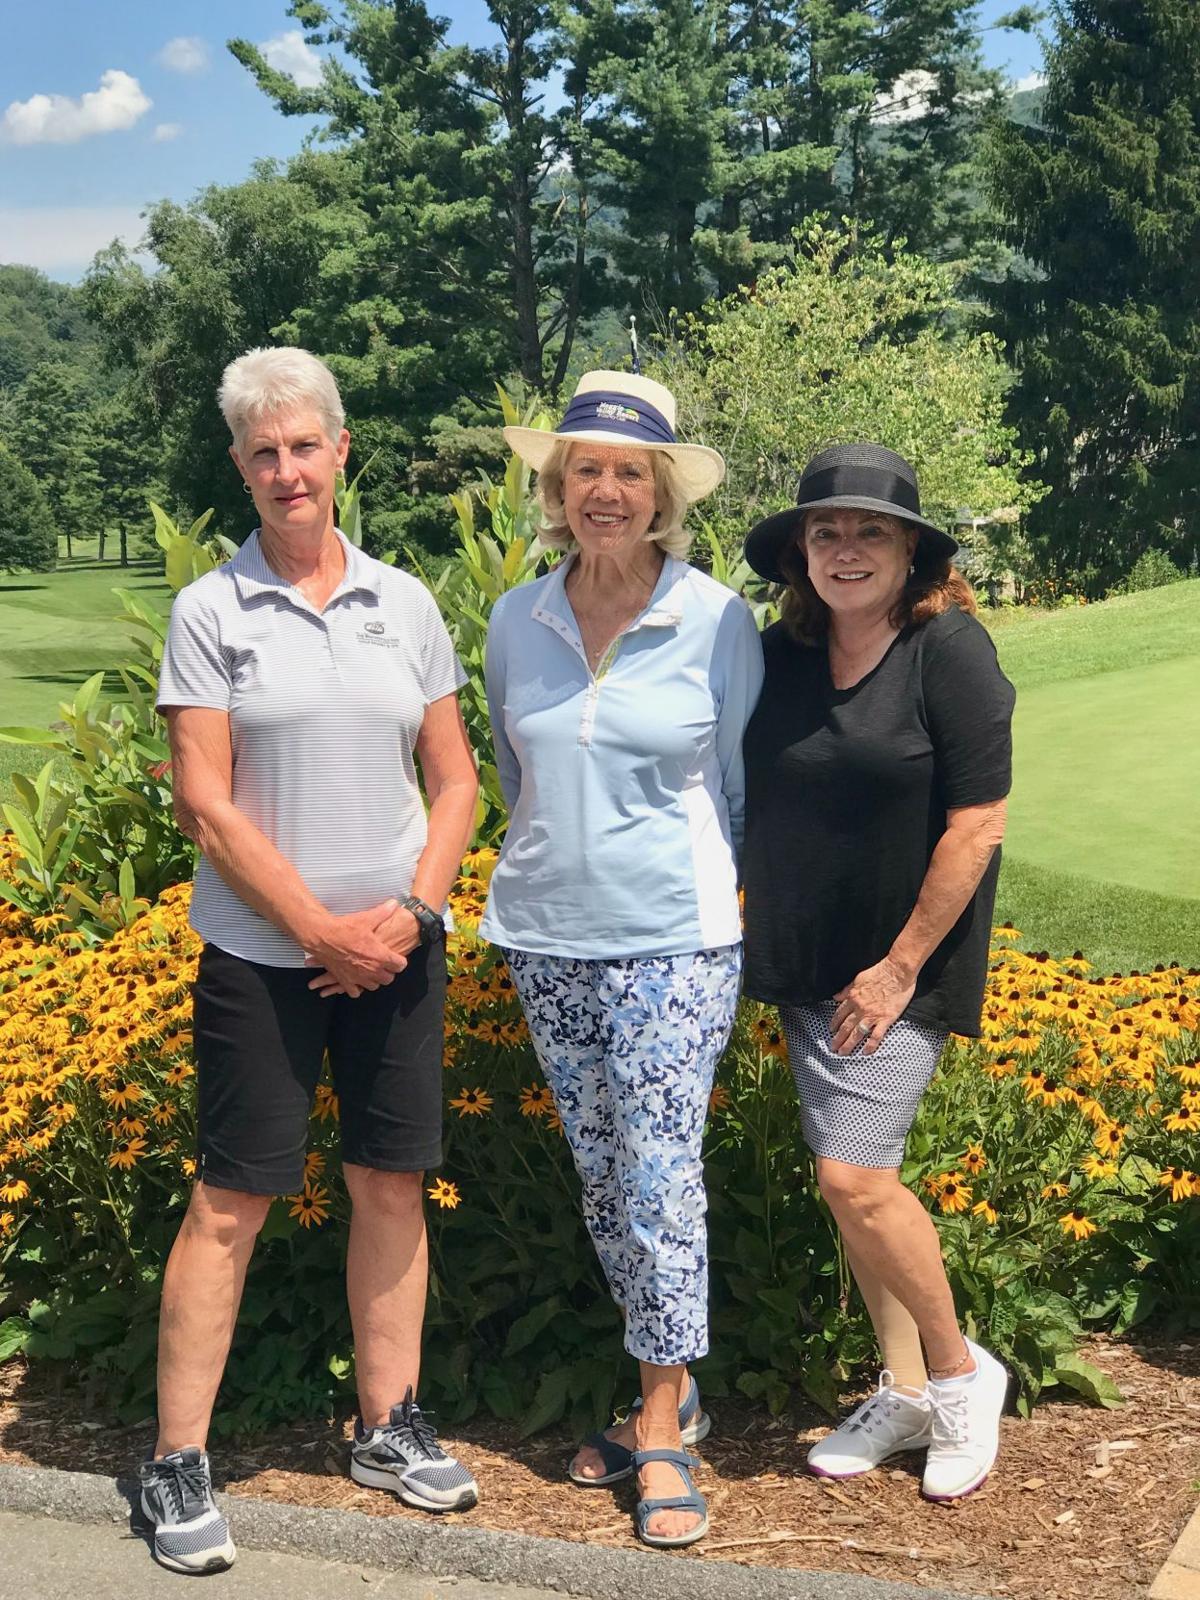 MVWGA 2019 Prevost Tournament Winners: Prestwood, Reetz, Flahardy